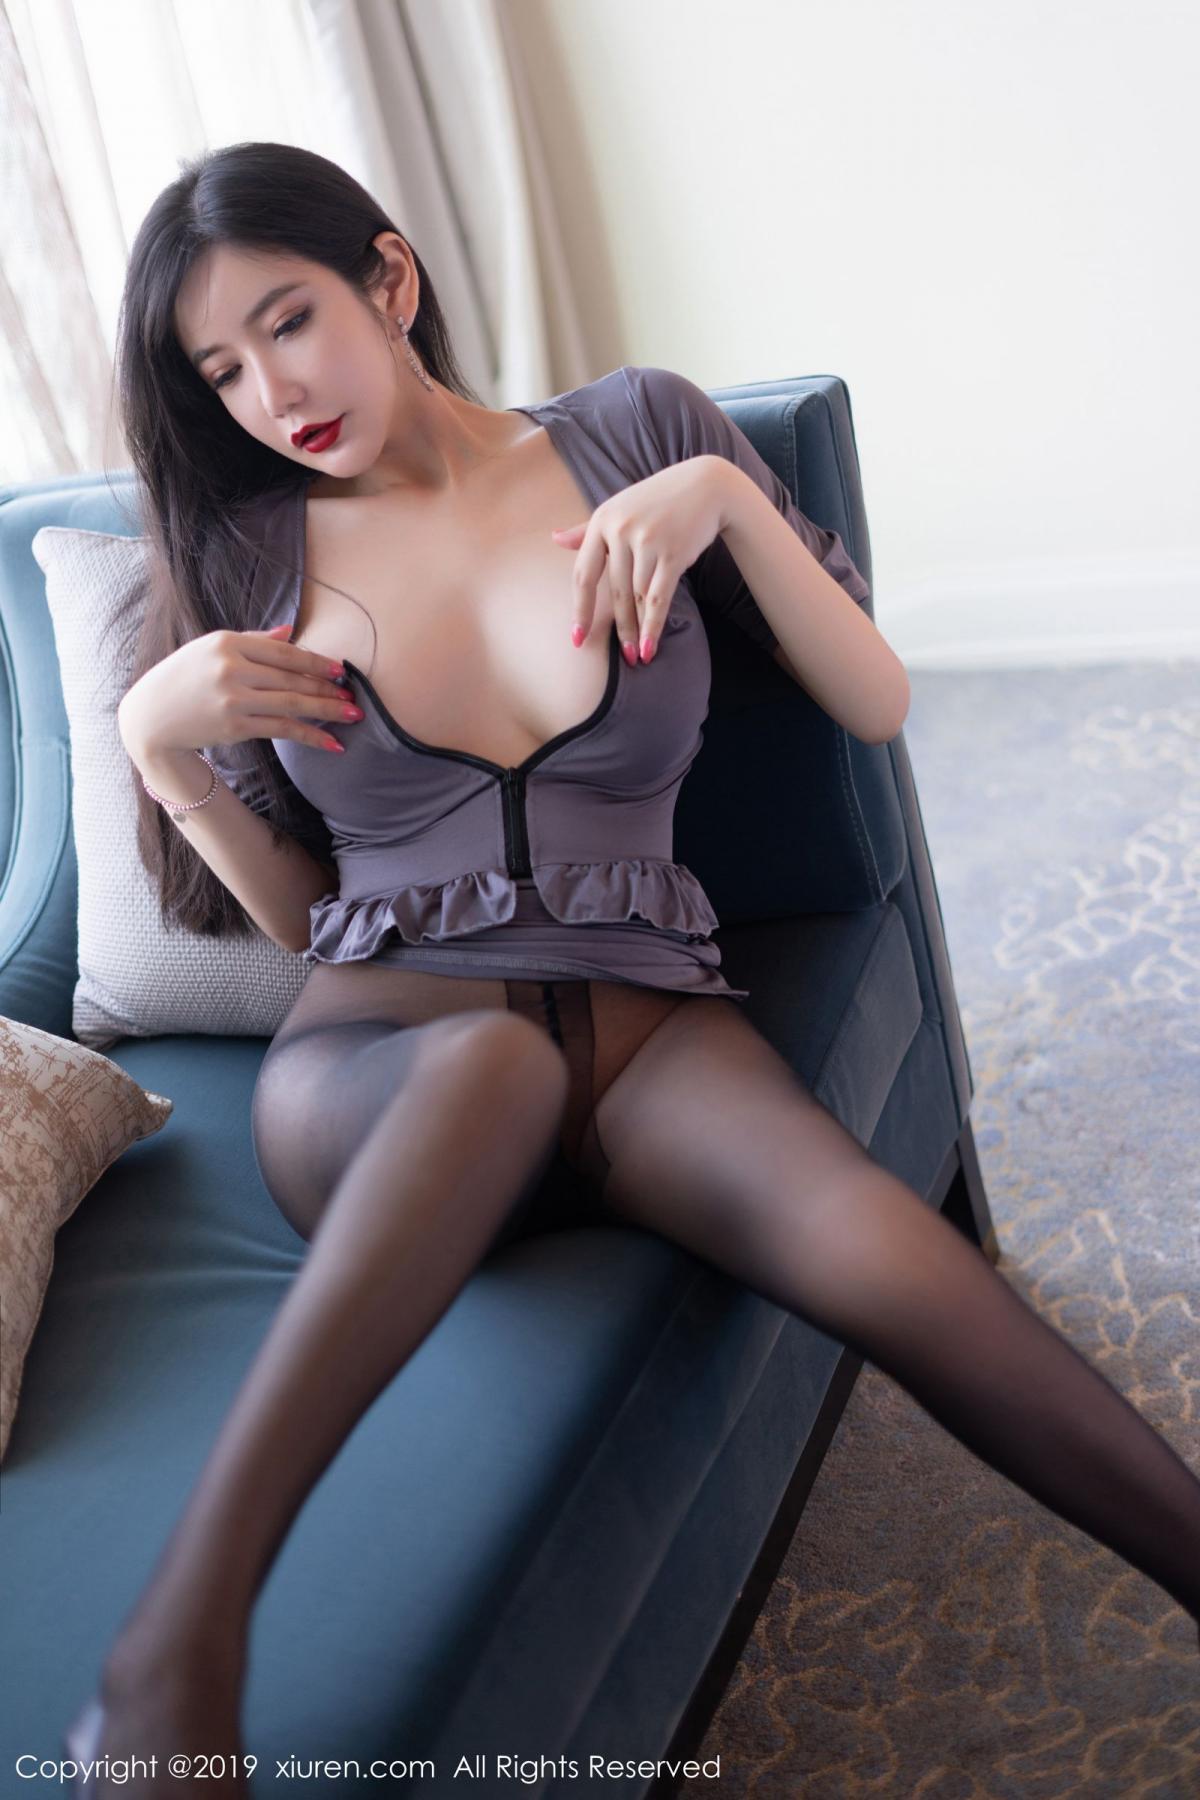 [XiuRen] Vol.1636 Li Yan Xi 19P, Li Yan Xi, Policewoman, Xiuren